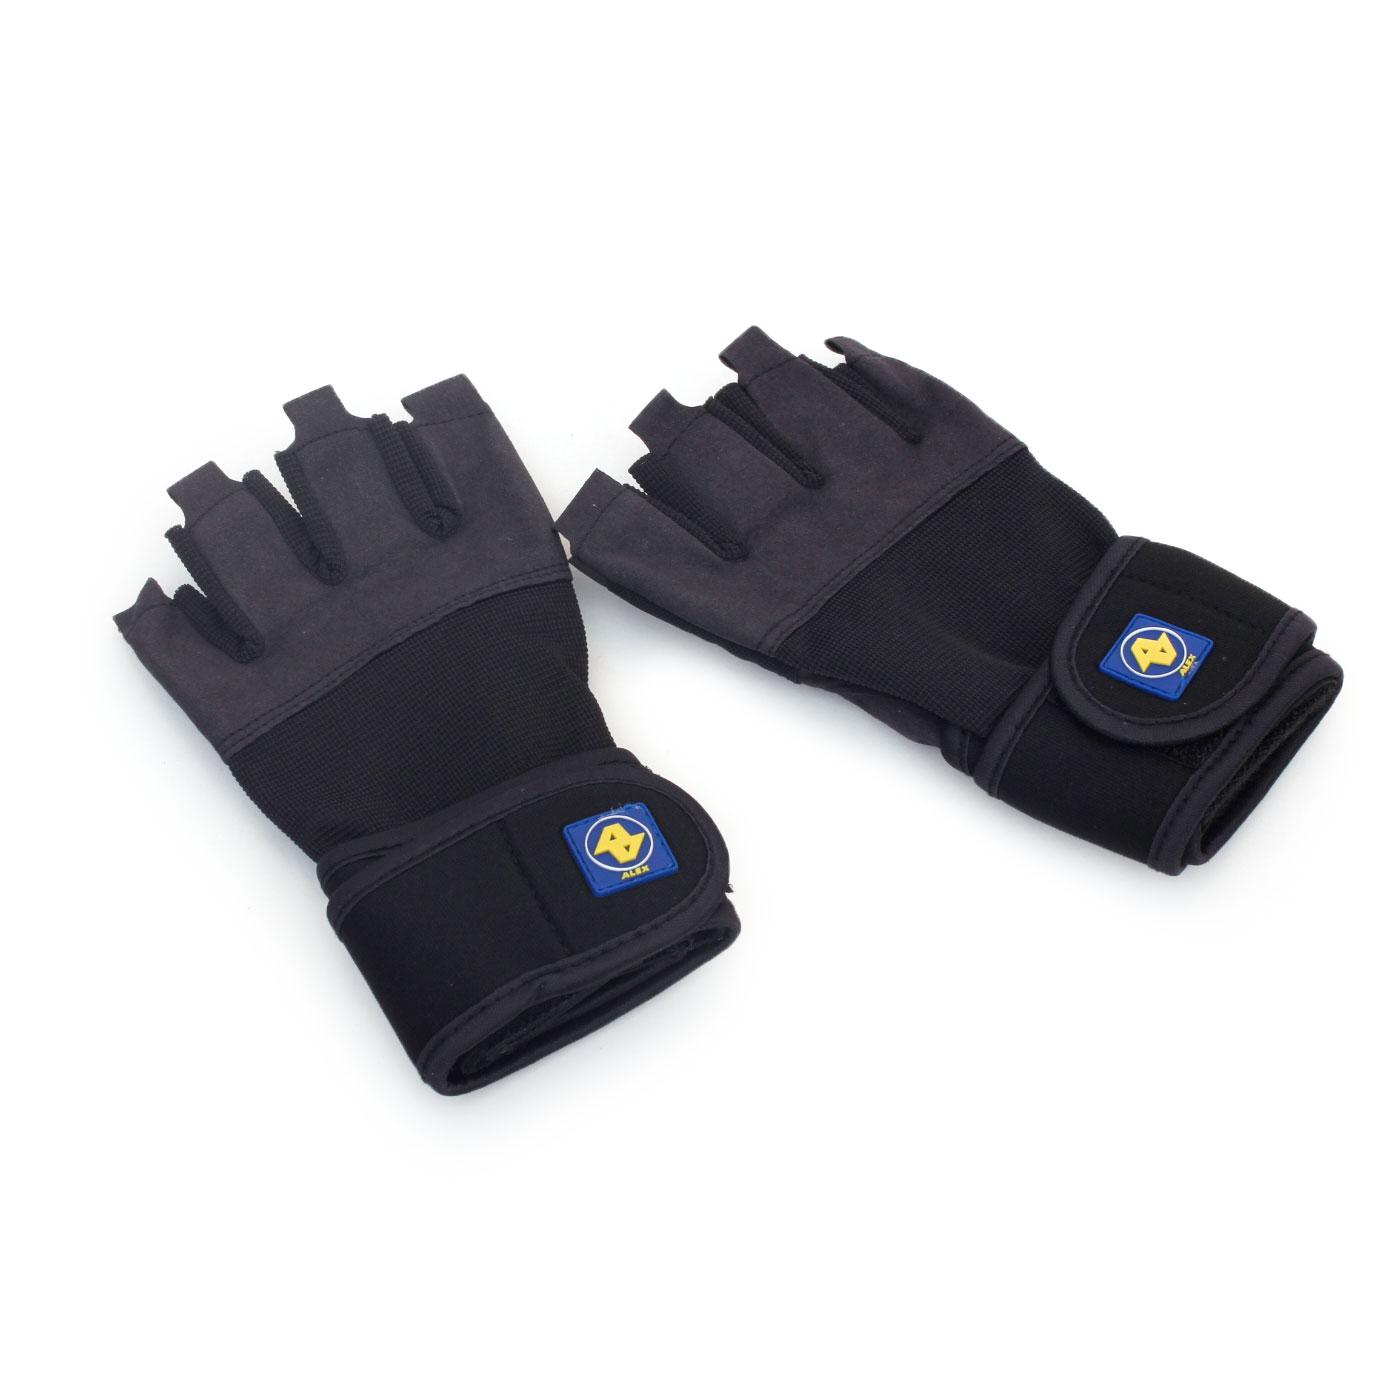 ALEX  重量訓練手套A-36 - 黑深灰